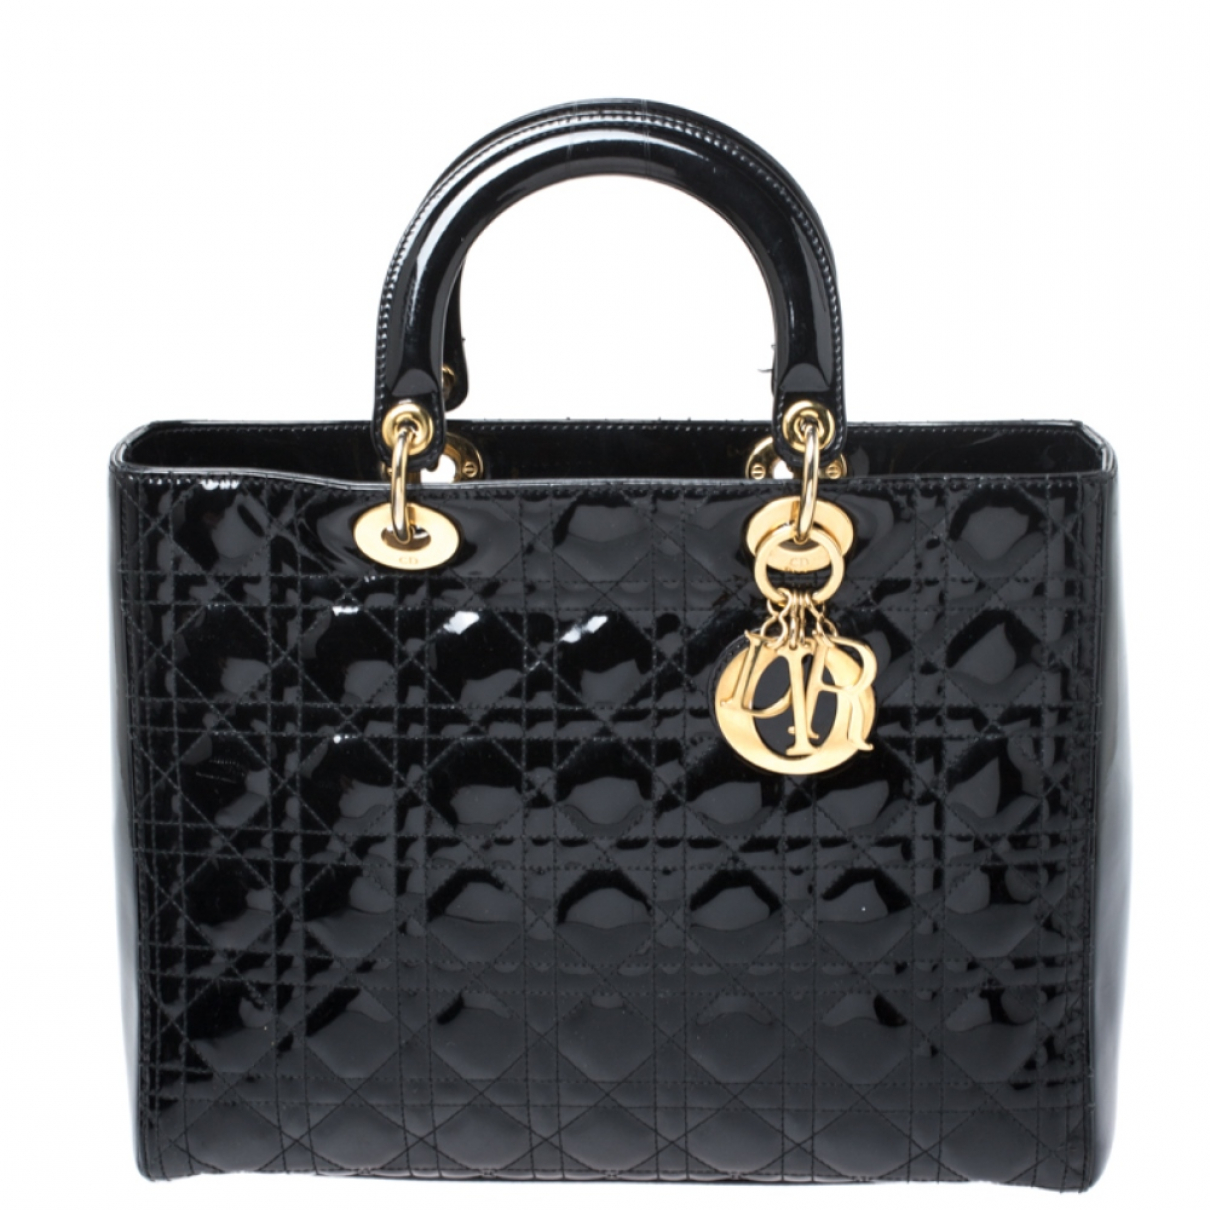 Dior \N Black Patent leather handbag for Women \N